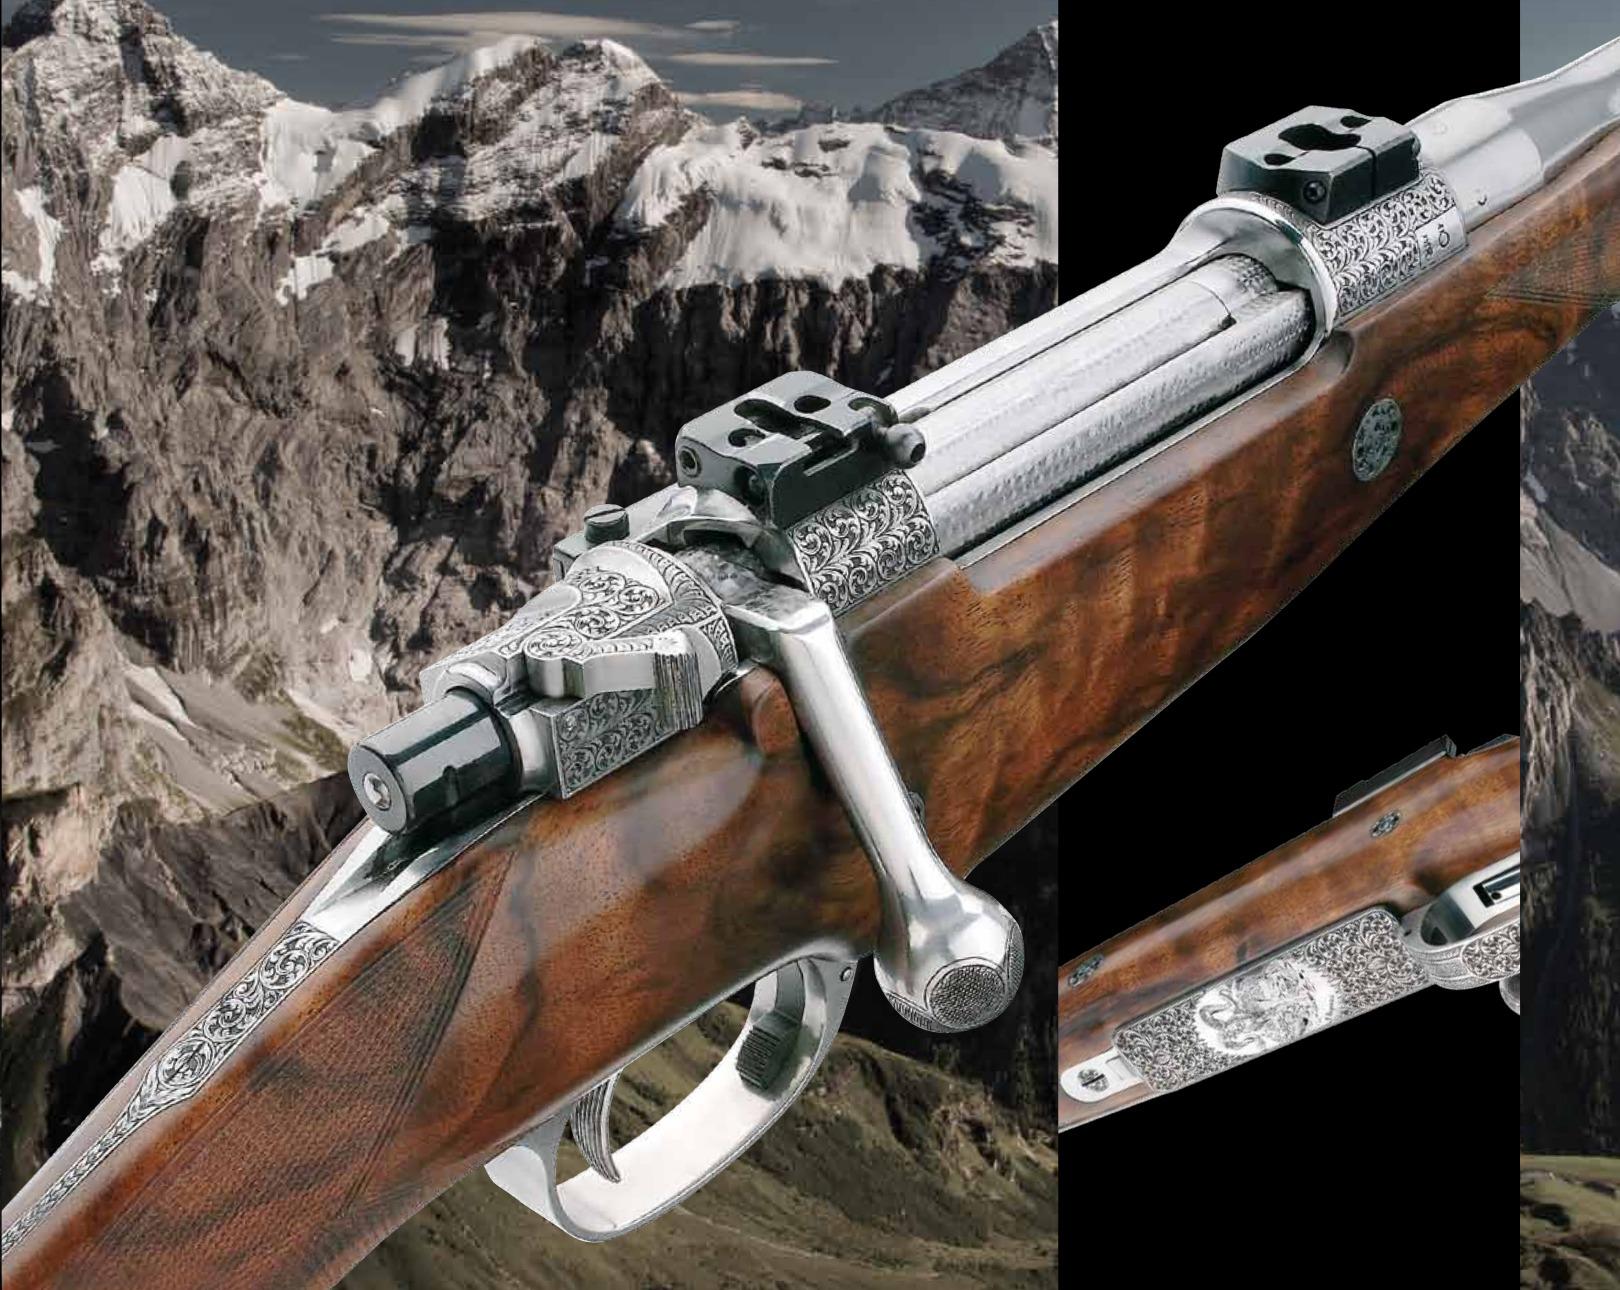 Grulla Armas C-95 bolt action magazine rifle